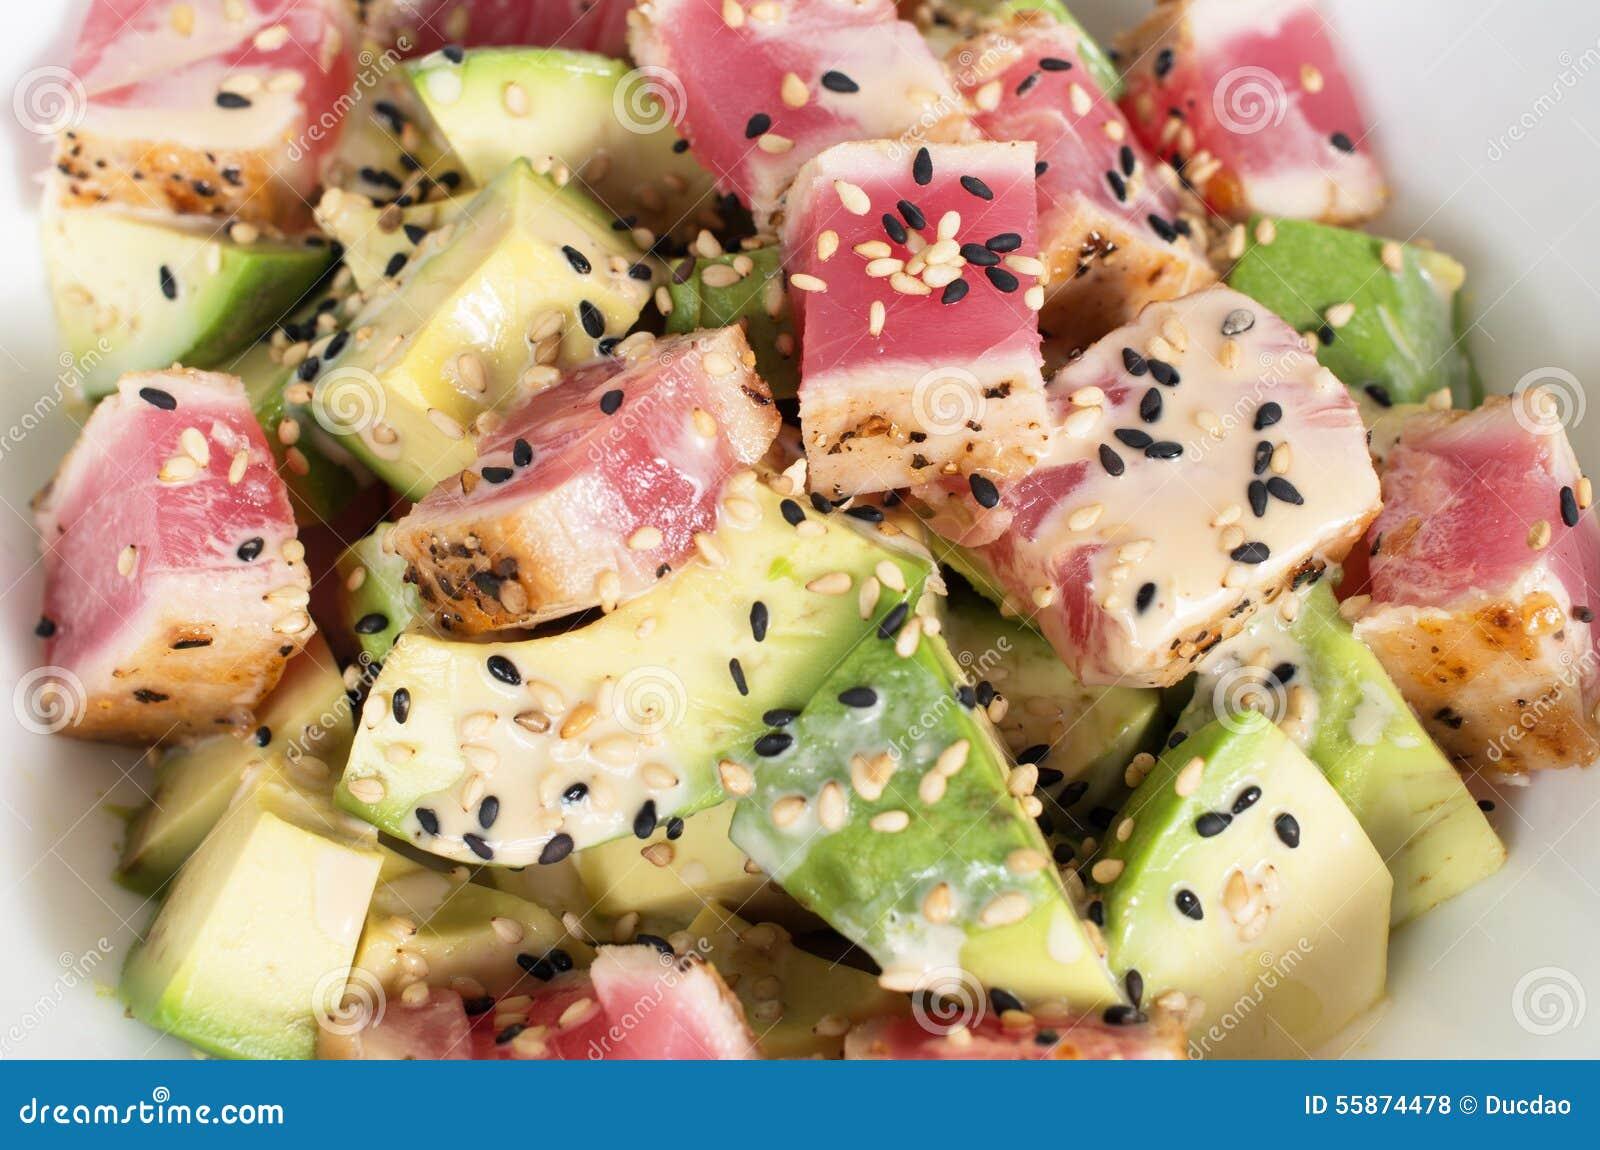 Tuna Salad Recipe Japanese